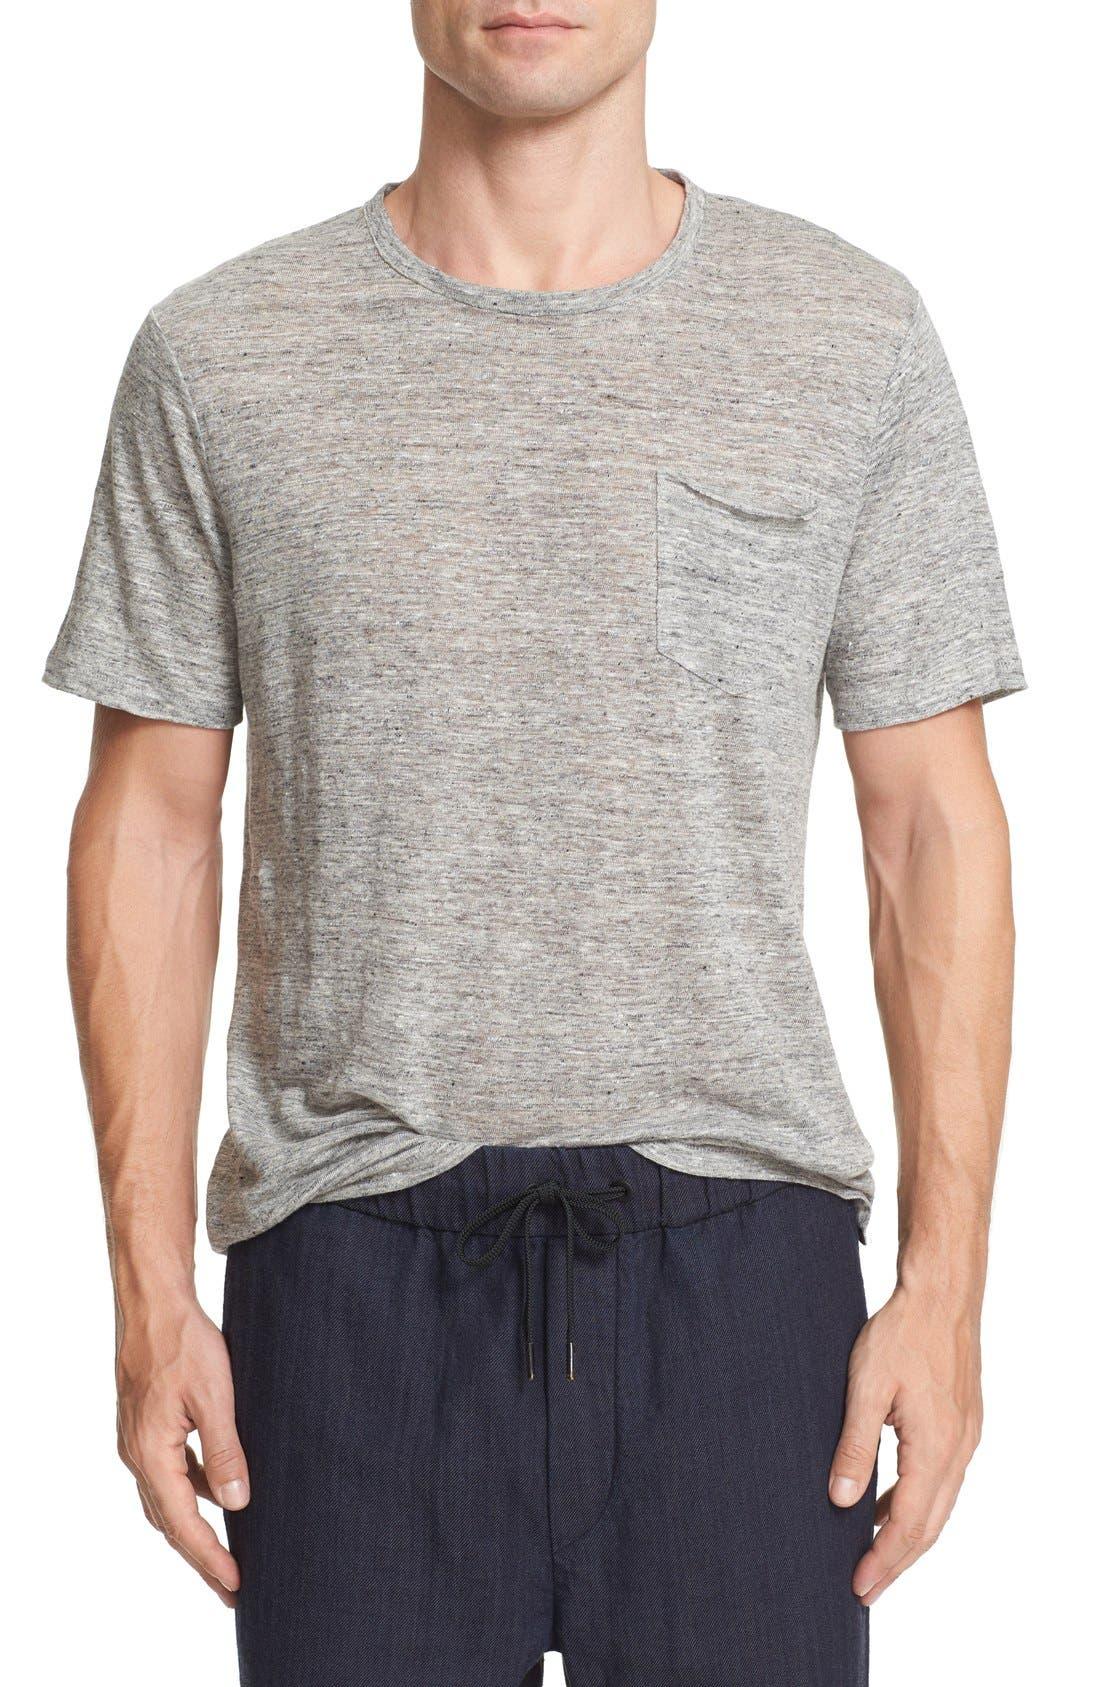 Owen Slub Linen T-Shirt,                         Main,                         color, 020